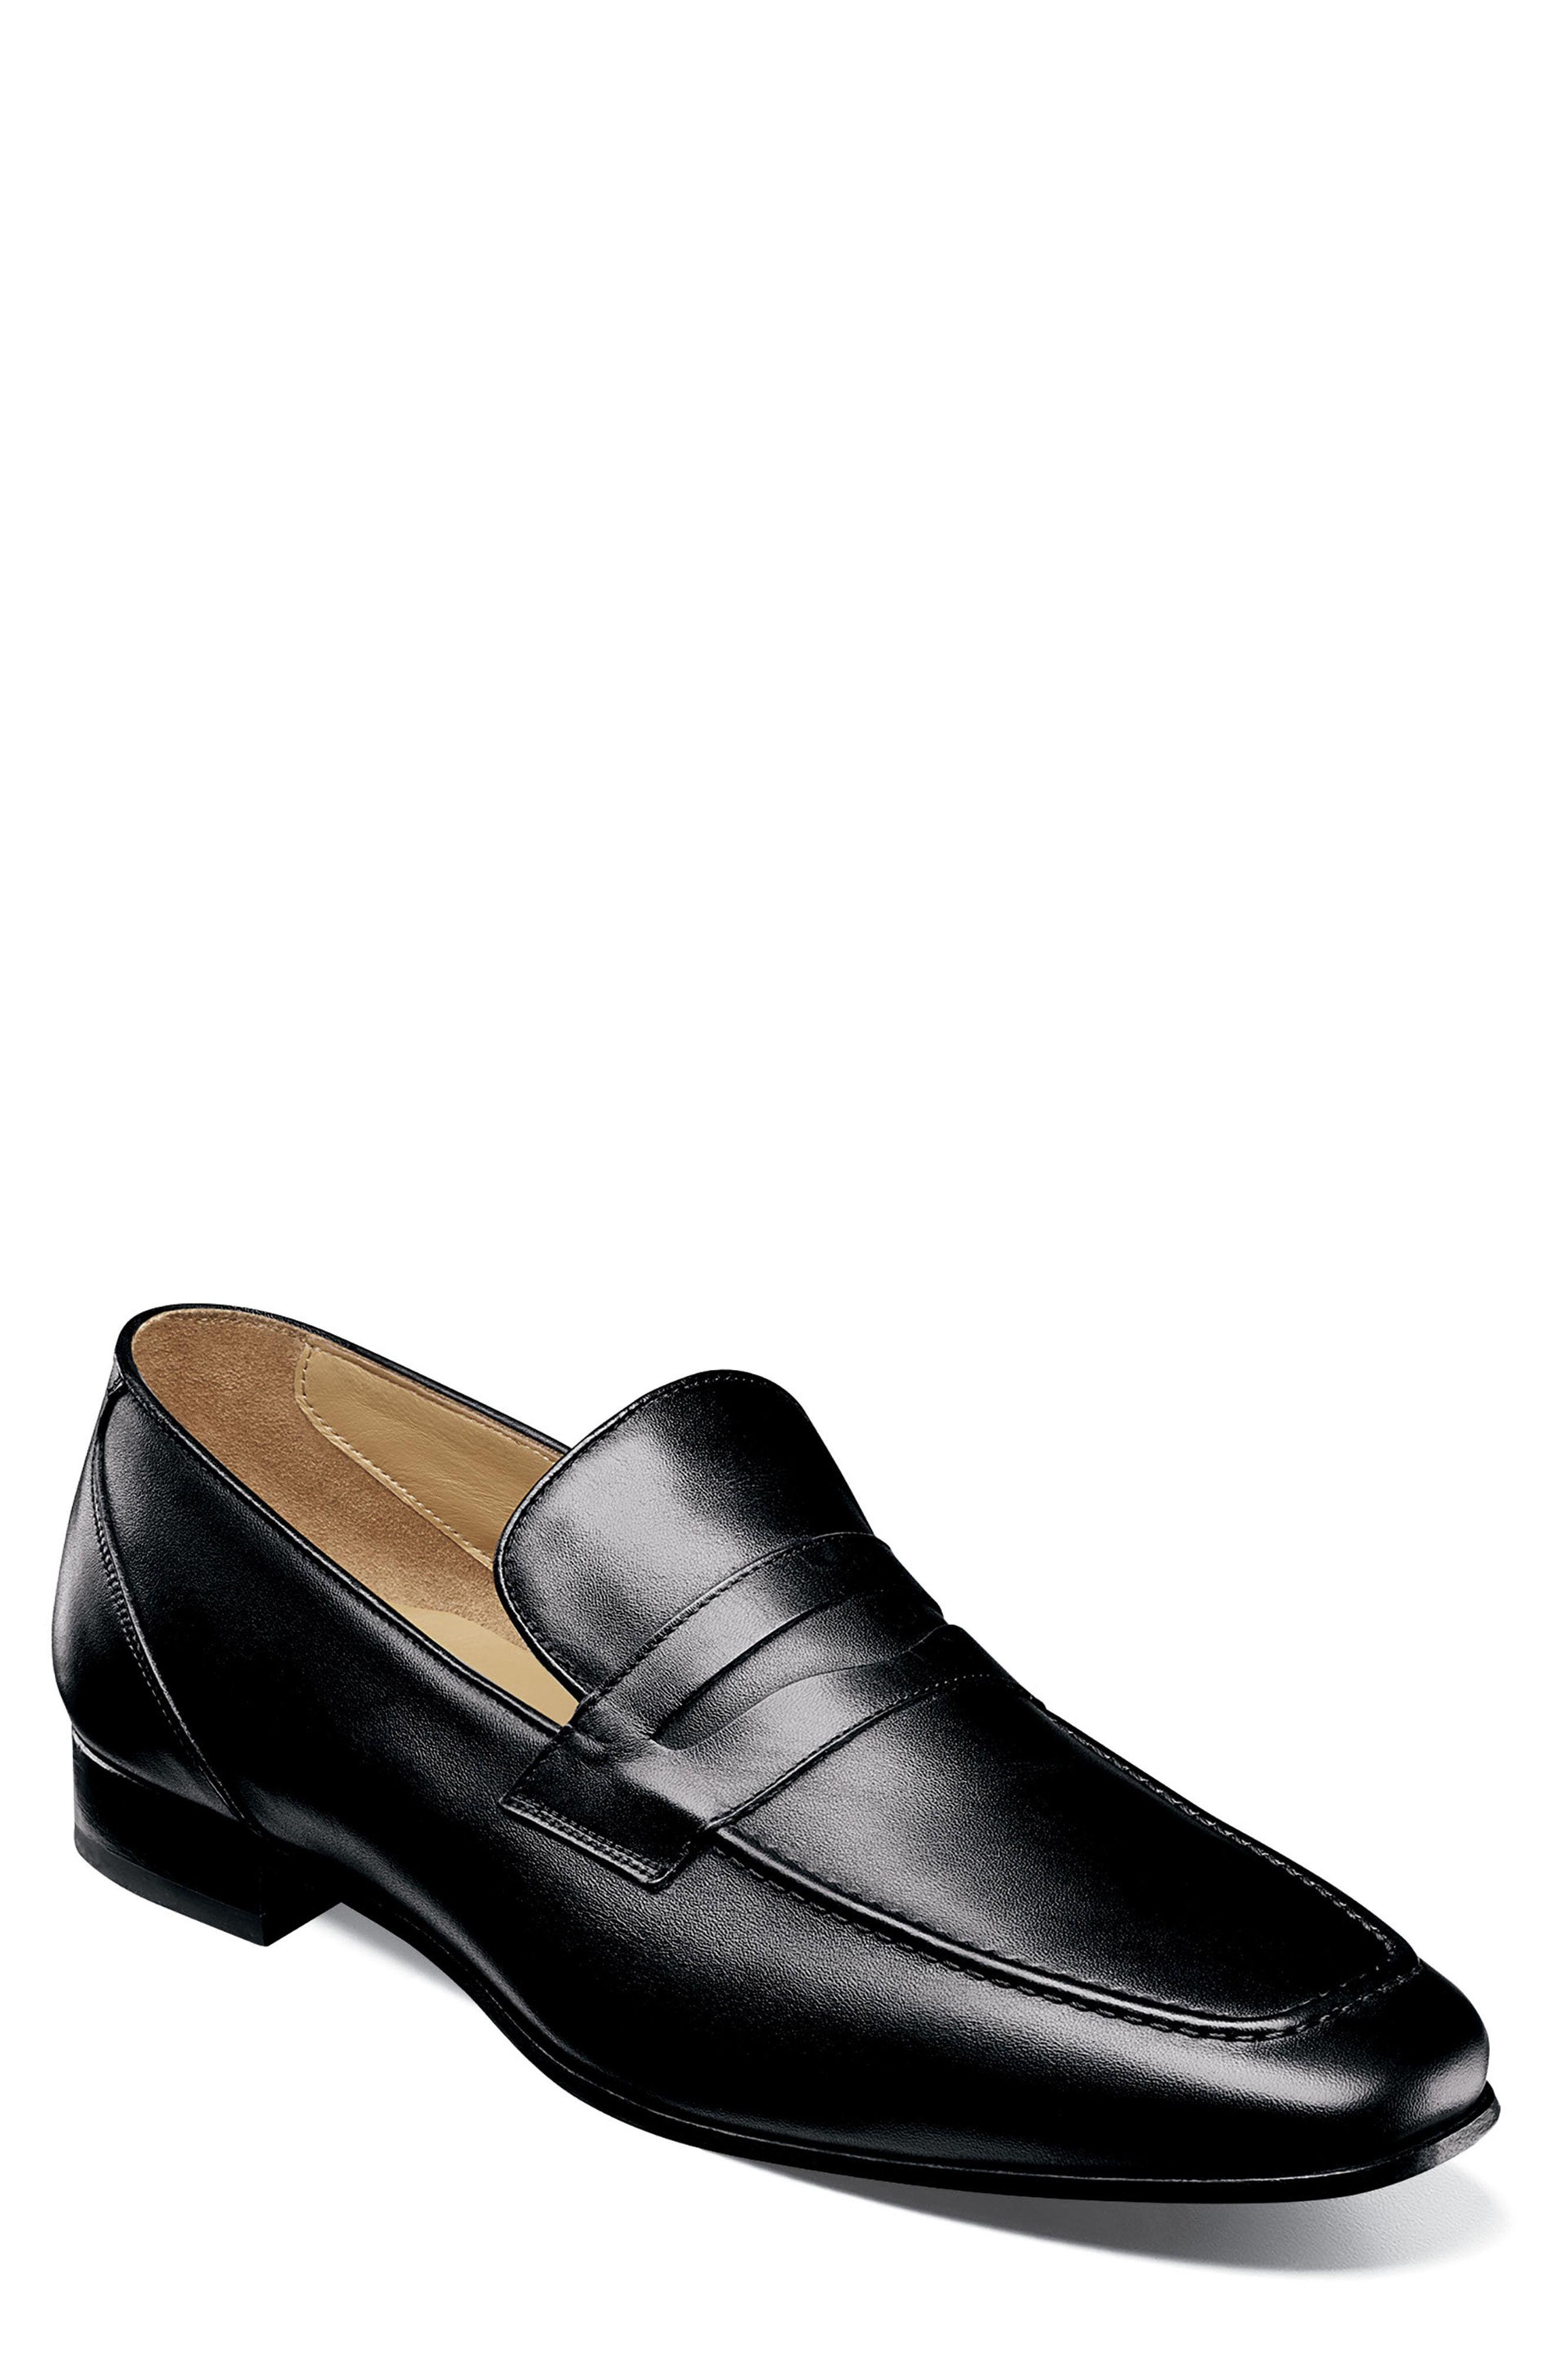 9132dfab645 FLORSHEIM IMPERIAL HOTTER PENNY LOAFER.  florsheim  shoes ...